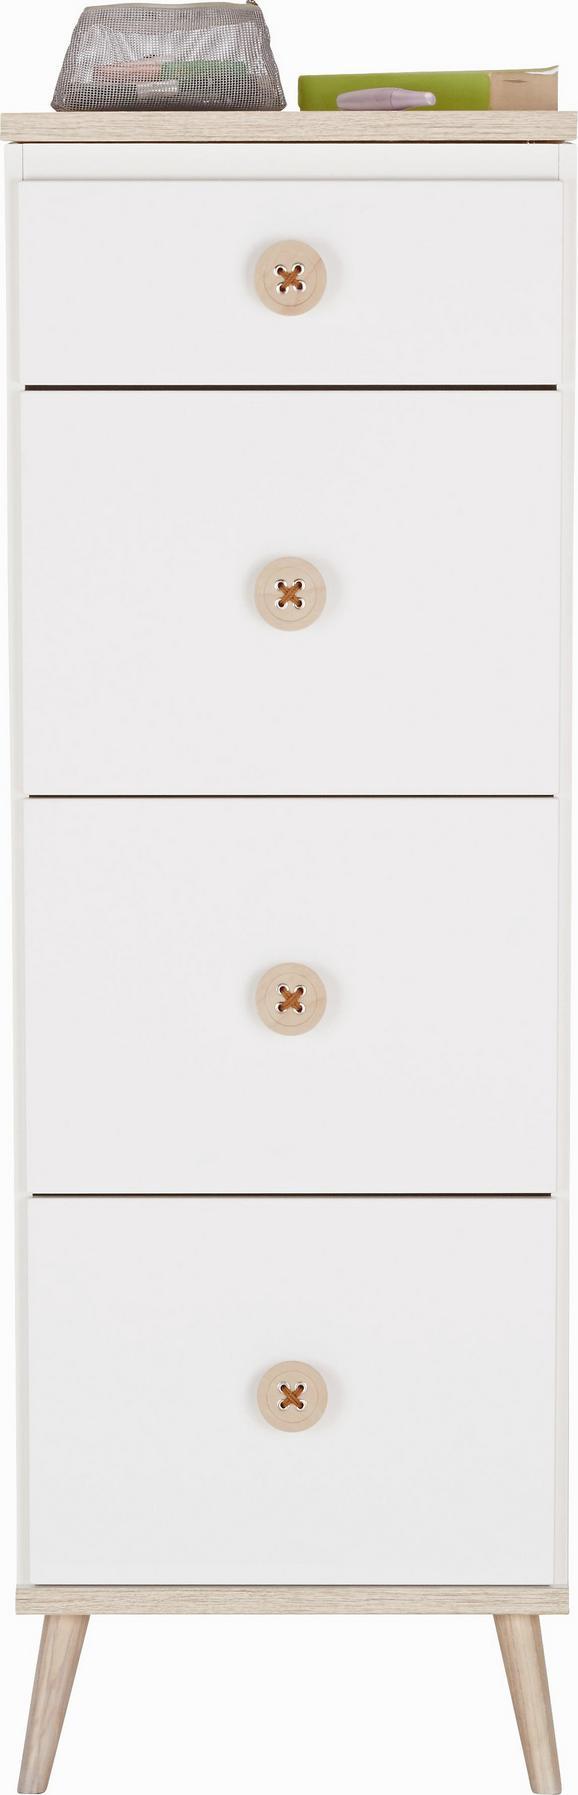 Komoda Billund - hrast/bela, Moderno, leseni material/les (46/121/40cm) - Modern Living